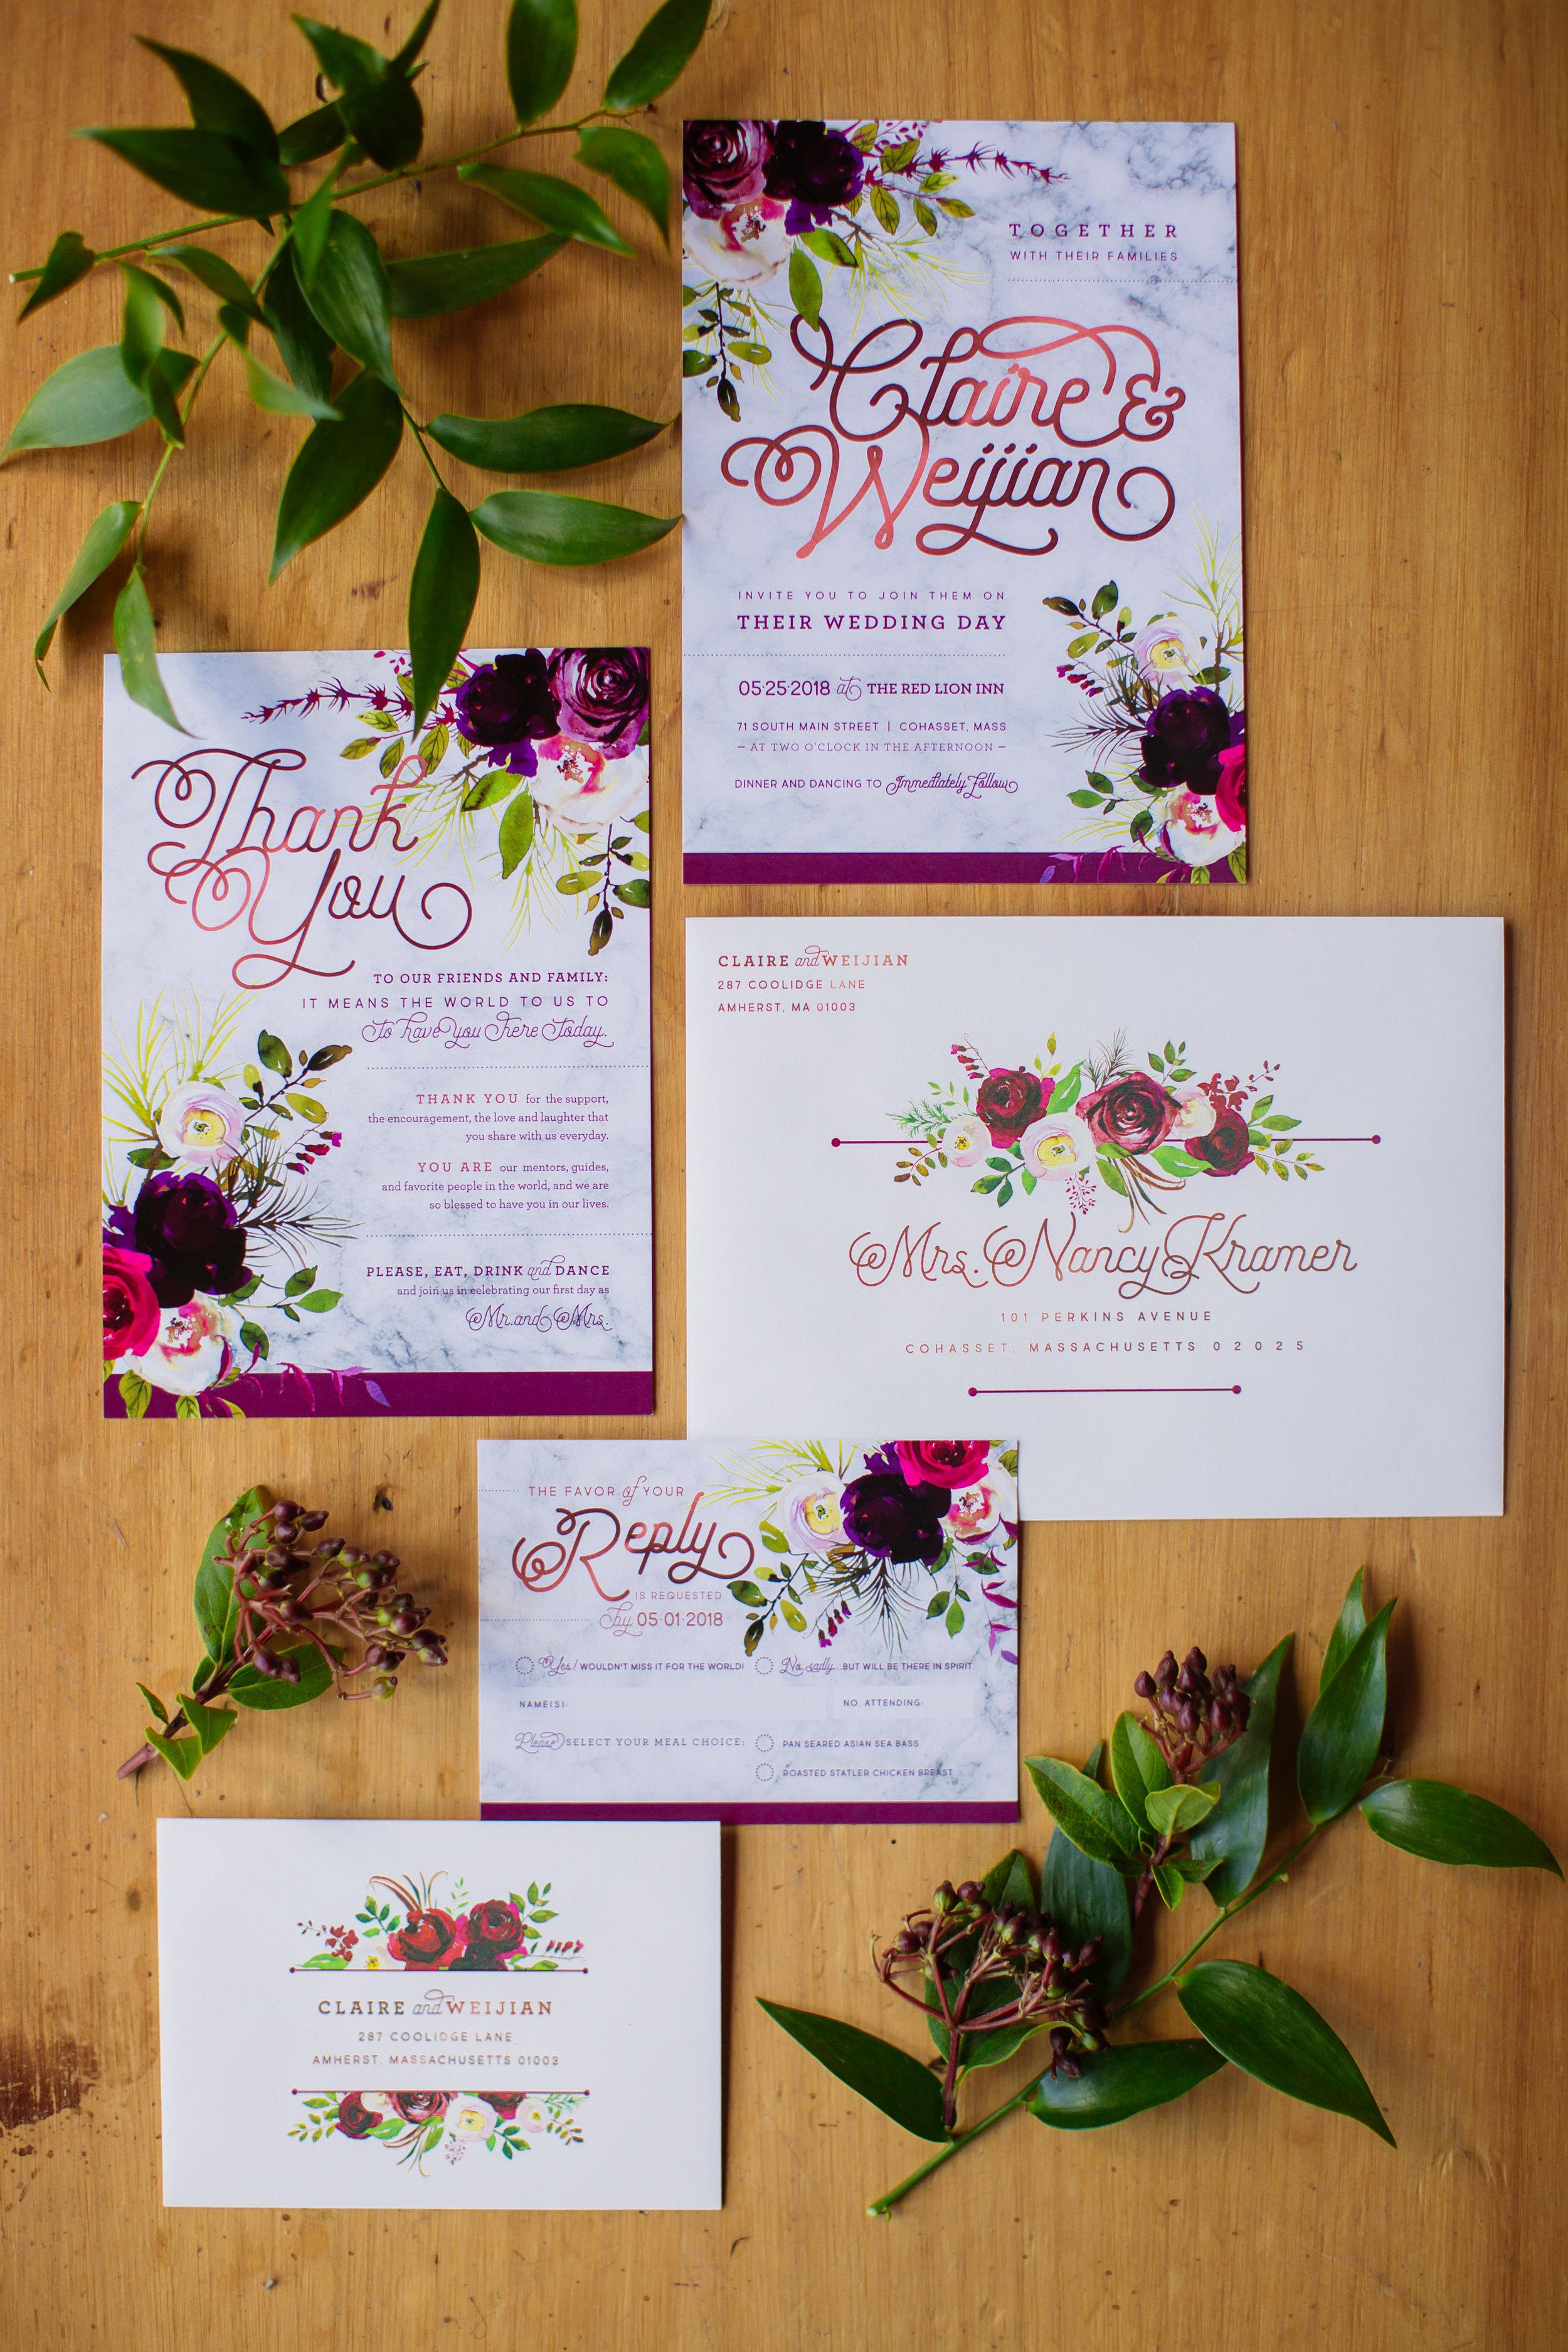 Boston_Wedding_Invitations.JPG